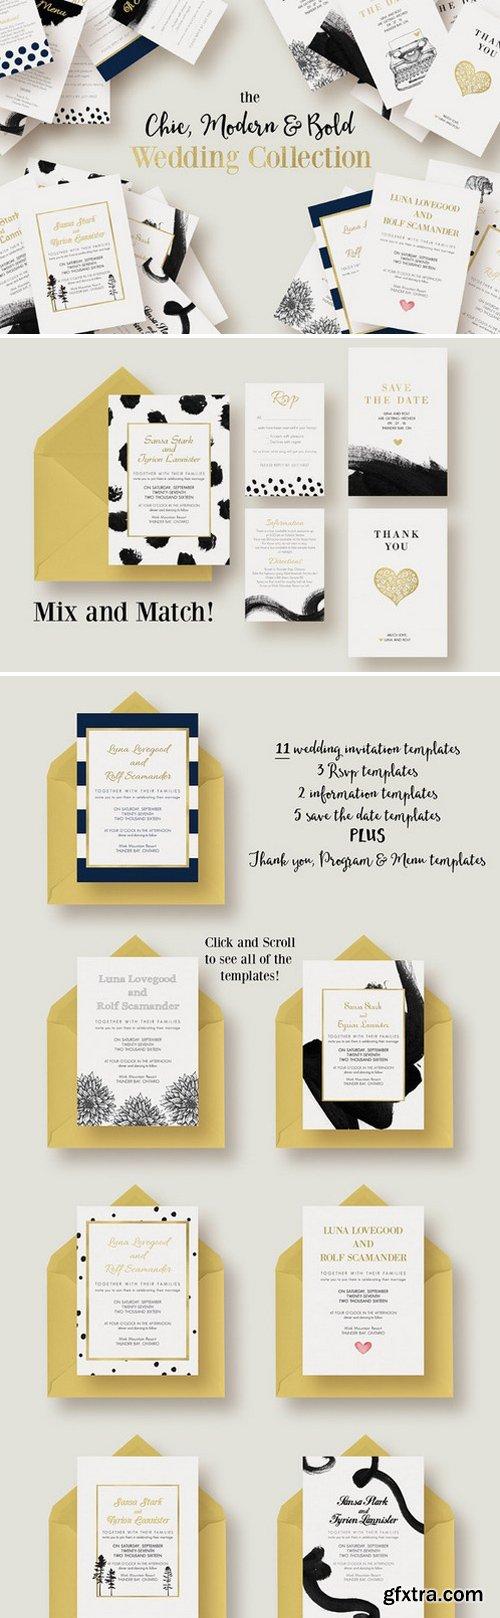 CM - Chic,Modern&Bold Wedding Collection 325013